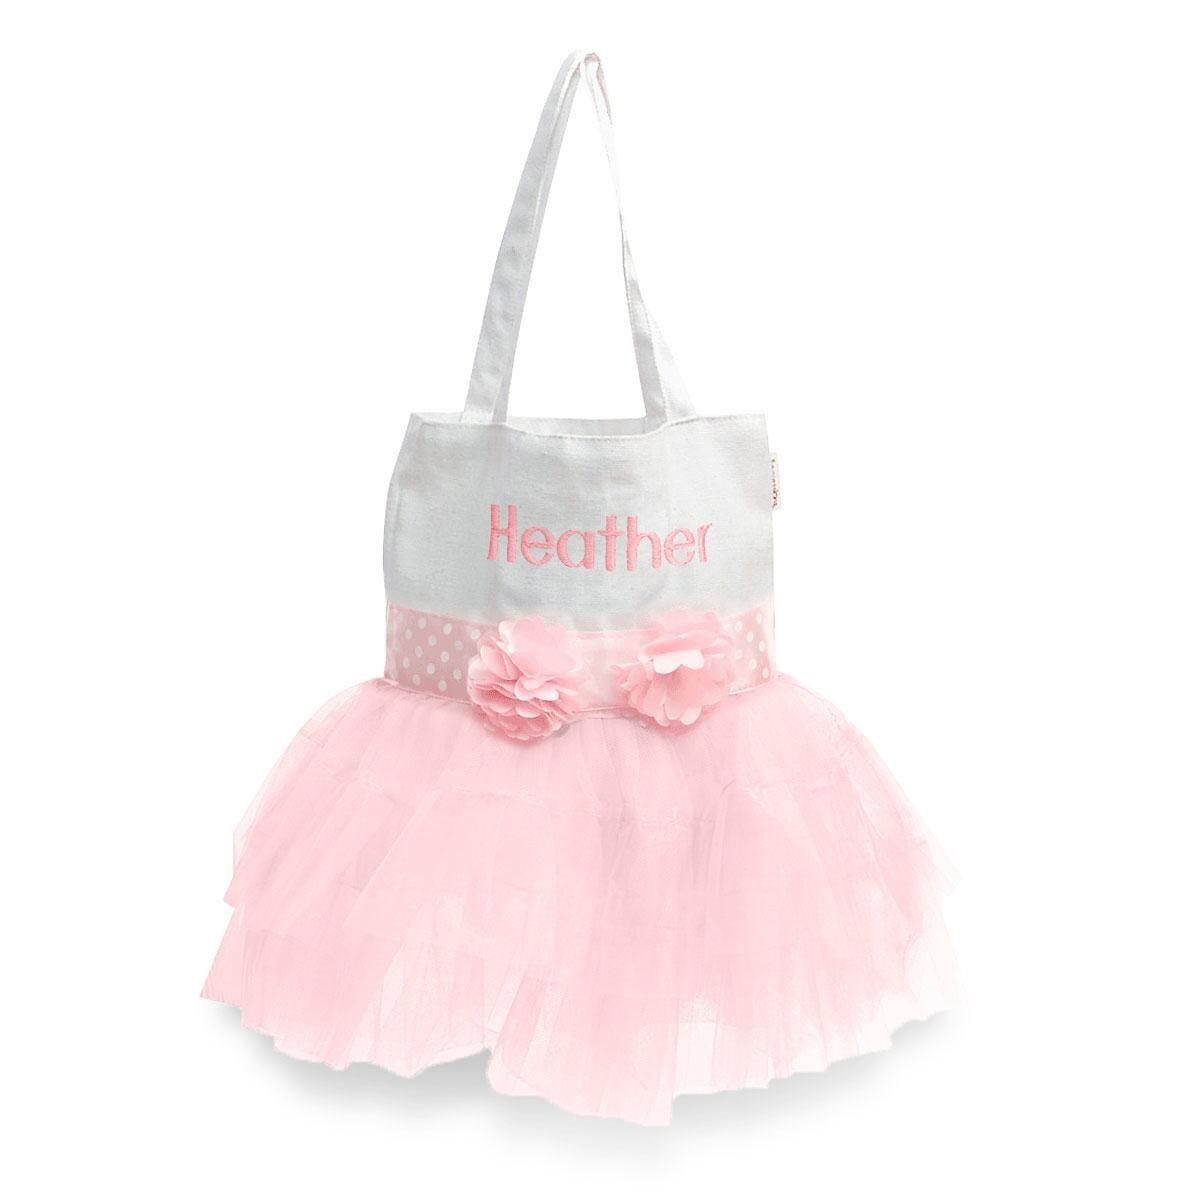 TuTu Skirt Tote in Pink